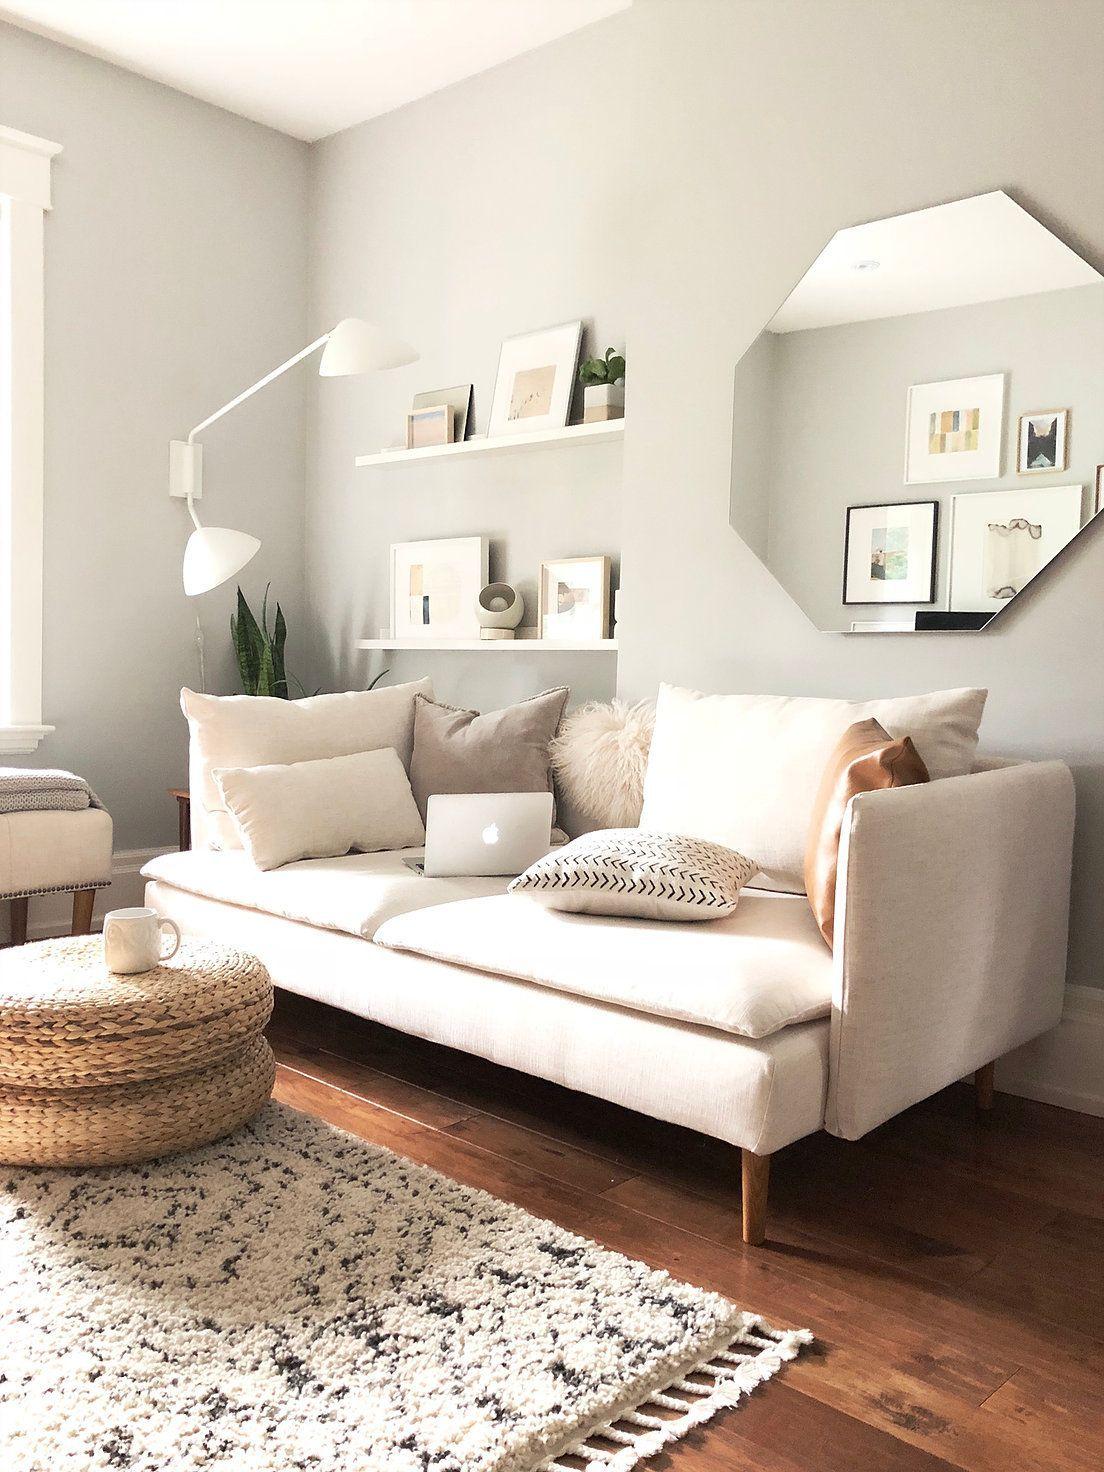 Single Post - Our IKEA Söderhamn Makeover & Comfort Works ...